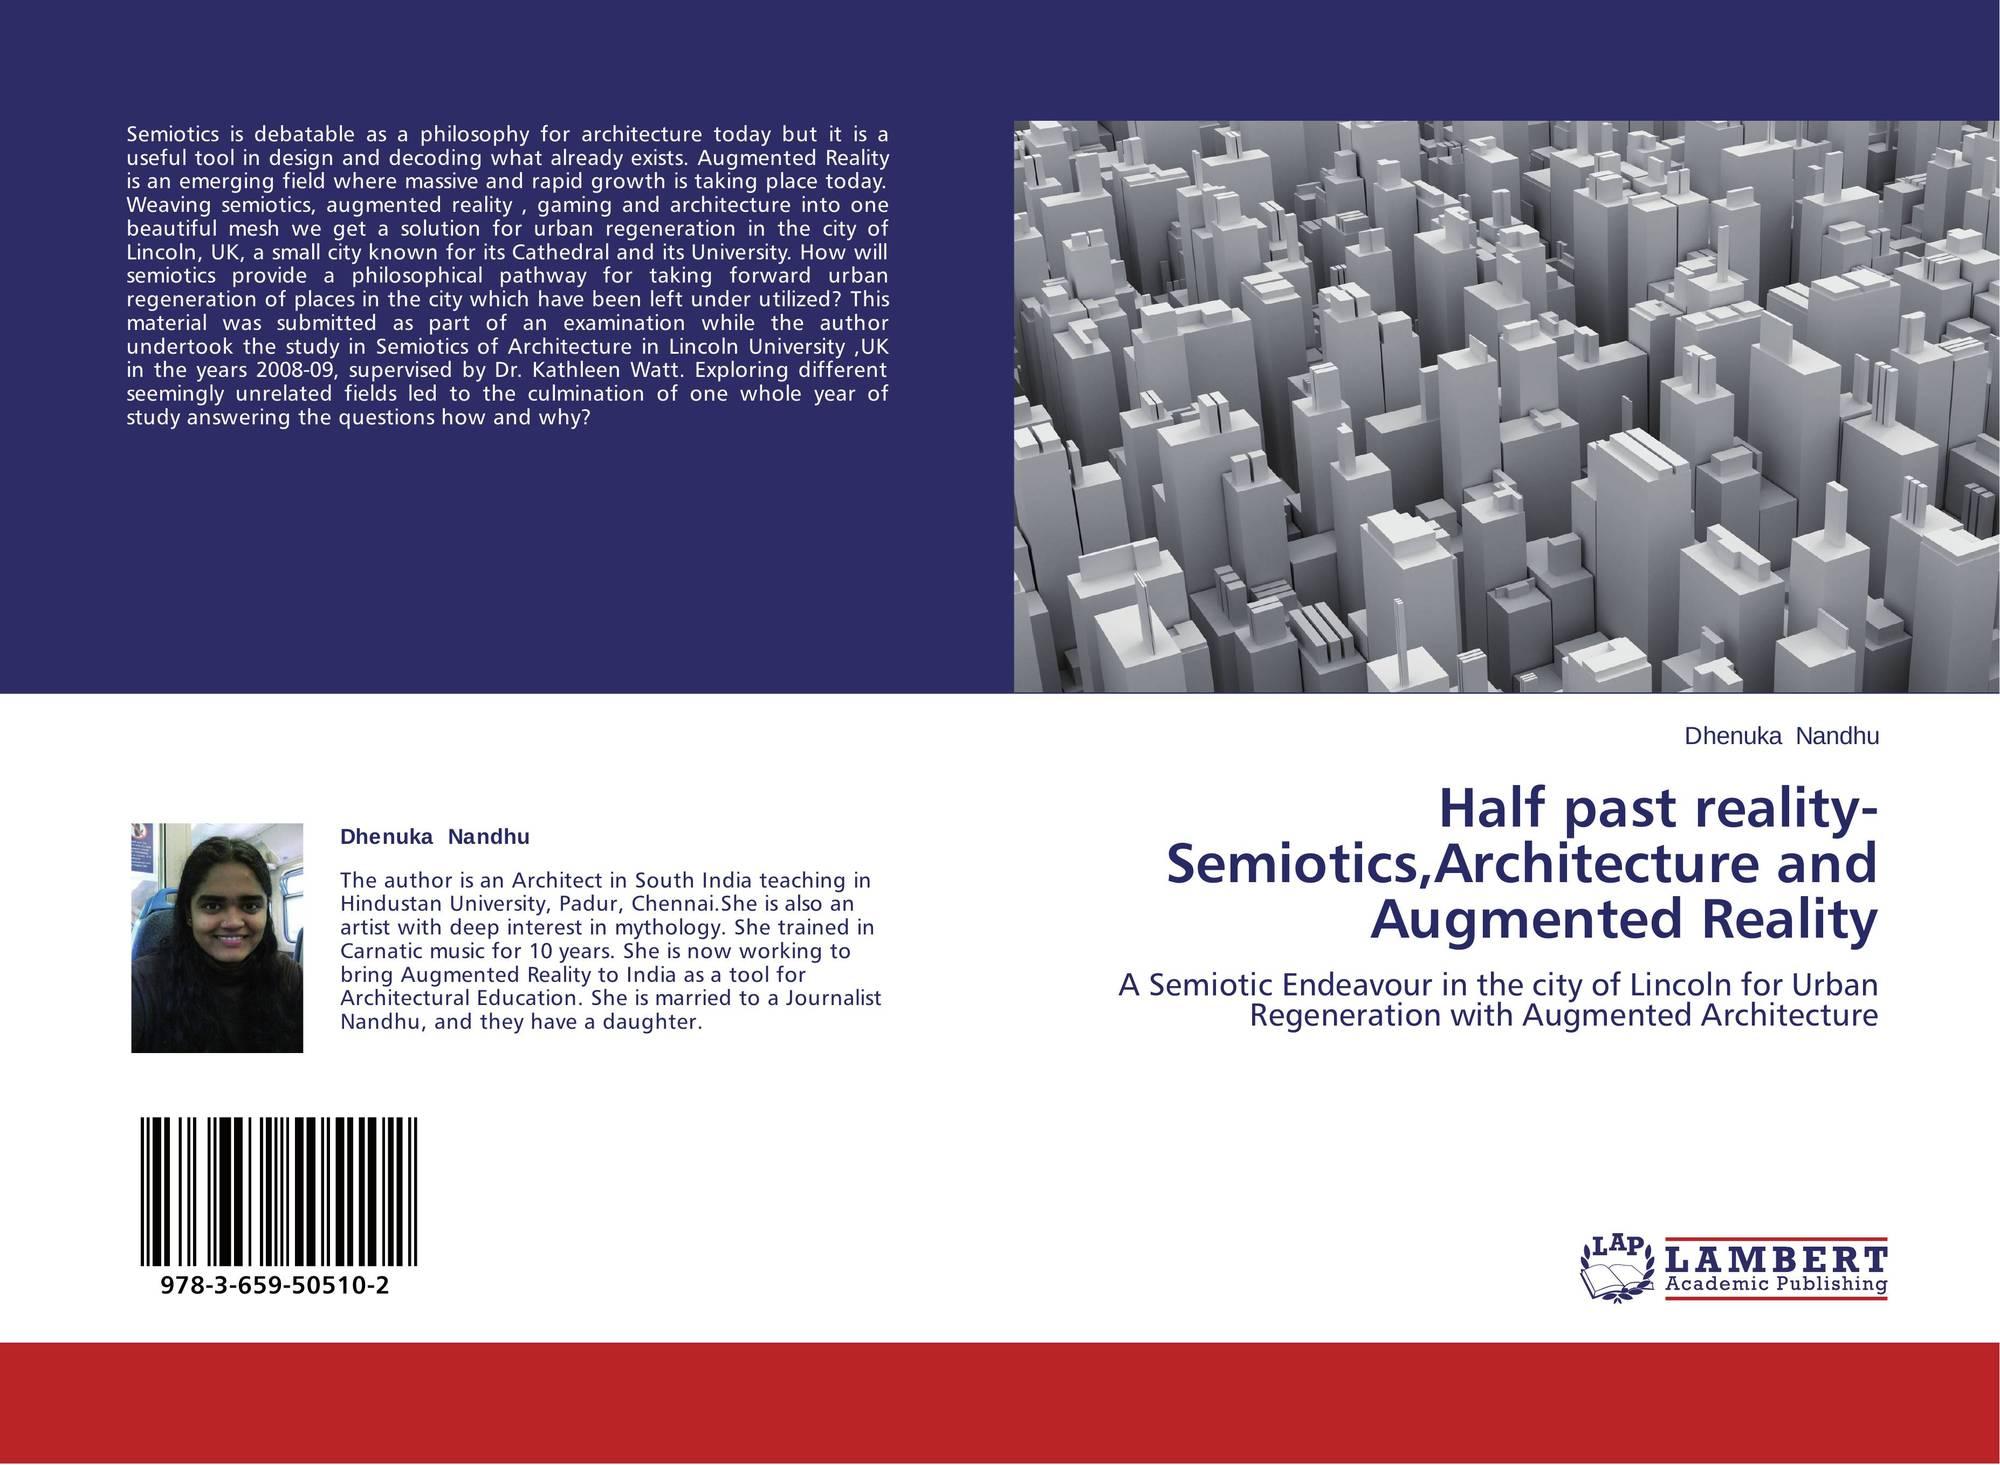 semiotics of architectural semiotics Semiotics, interpretation and political resistance introducing architecture into the theory of semiotics, jencks's diagram is an enduring image of architectural.